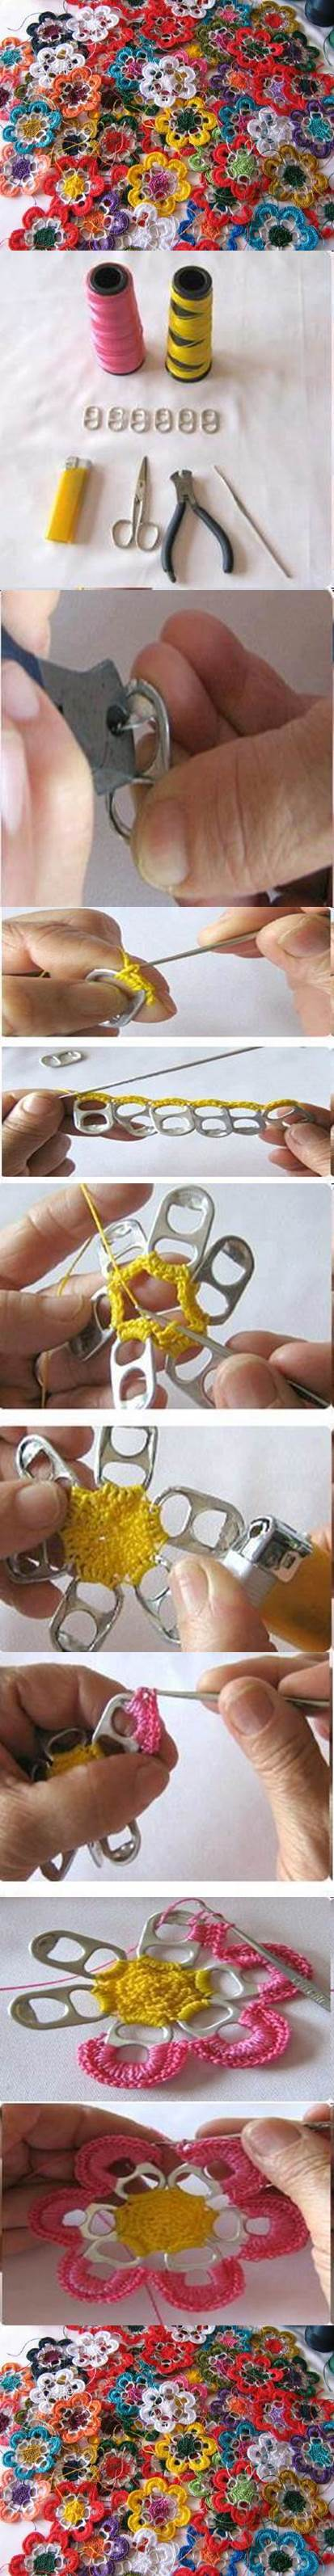 DIY Pull Tabs Crochet Flowers